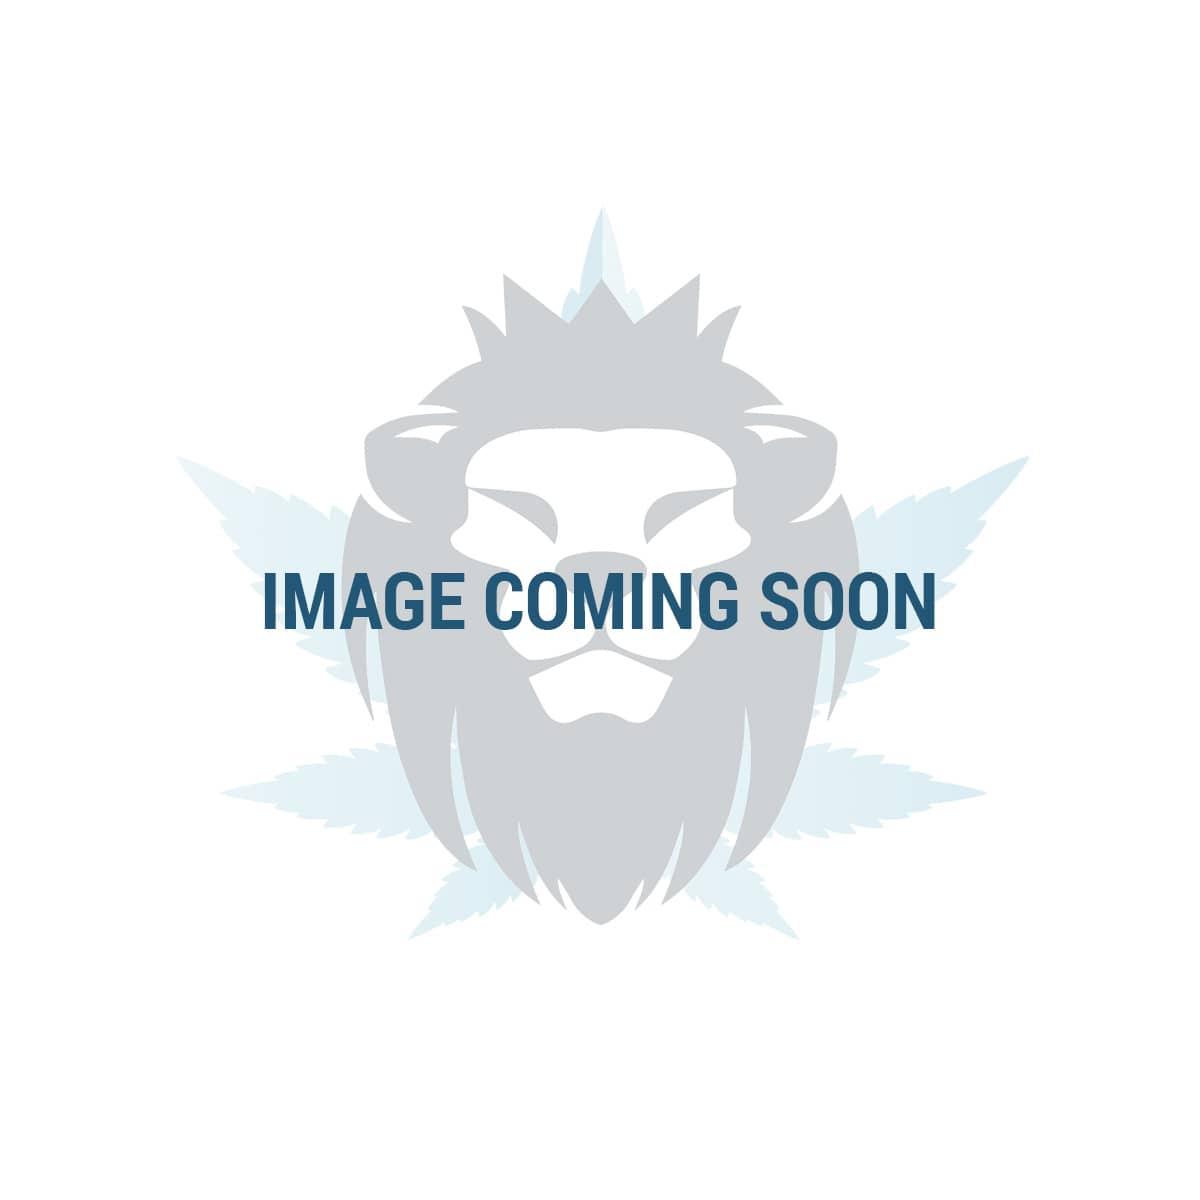 UV Stash Jar 100ml Comes with Velvet Case (Bag)